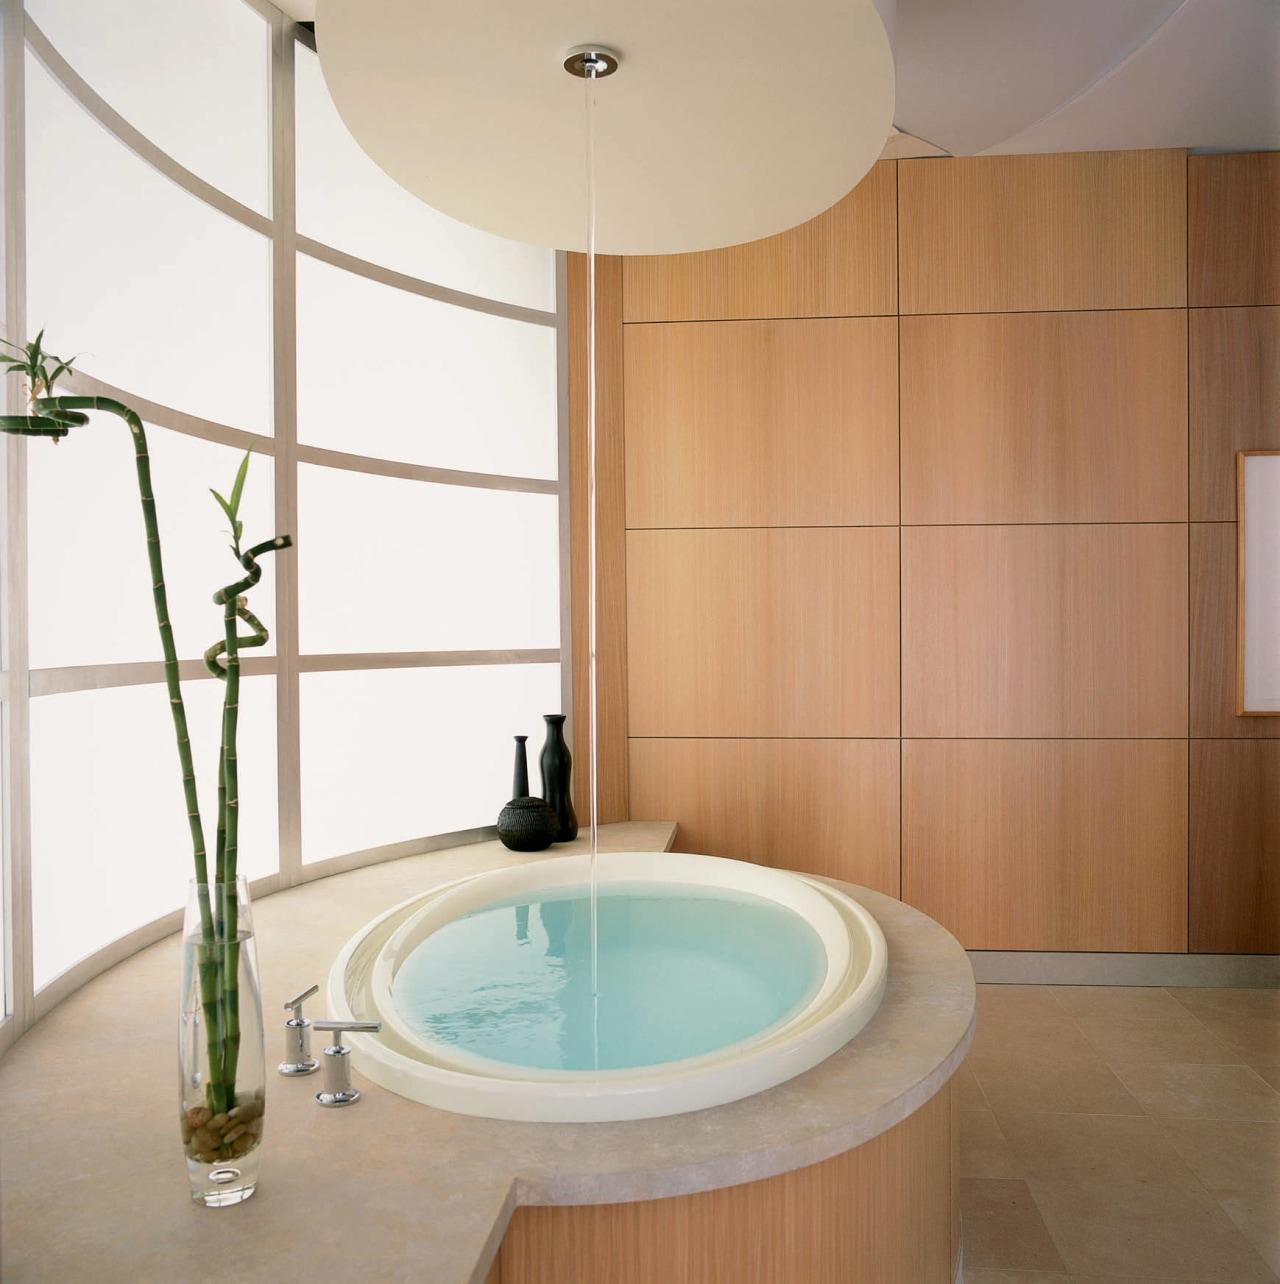 This round, built-in bathtub has a filler mounted bathroom, bathtub, ceiling, ceramic, floor, interior design, plumbing fixture, room, sink, tap, tile, white